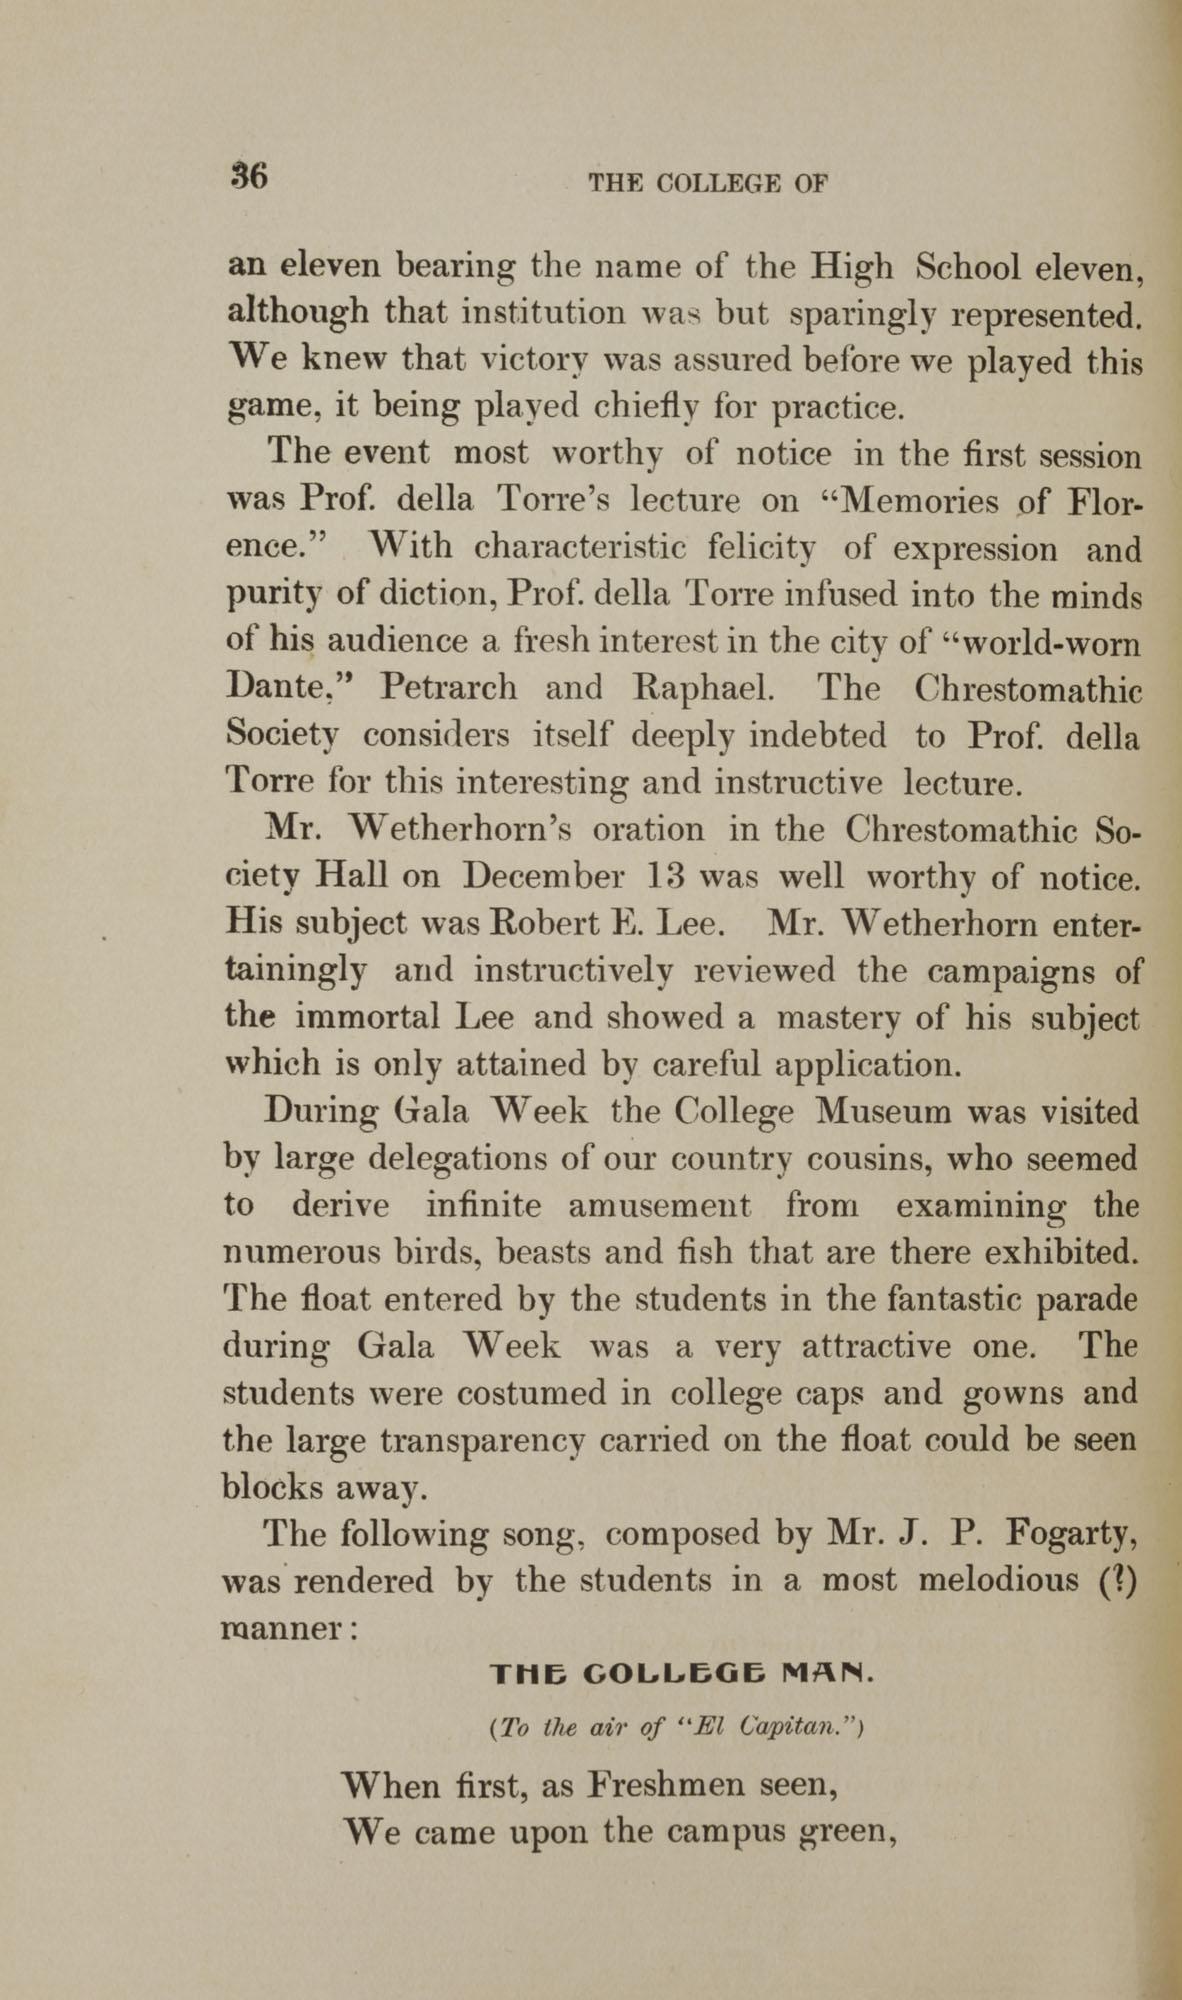 College of Charleston Magazine, 1898, Vol I. No. 1, page 36